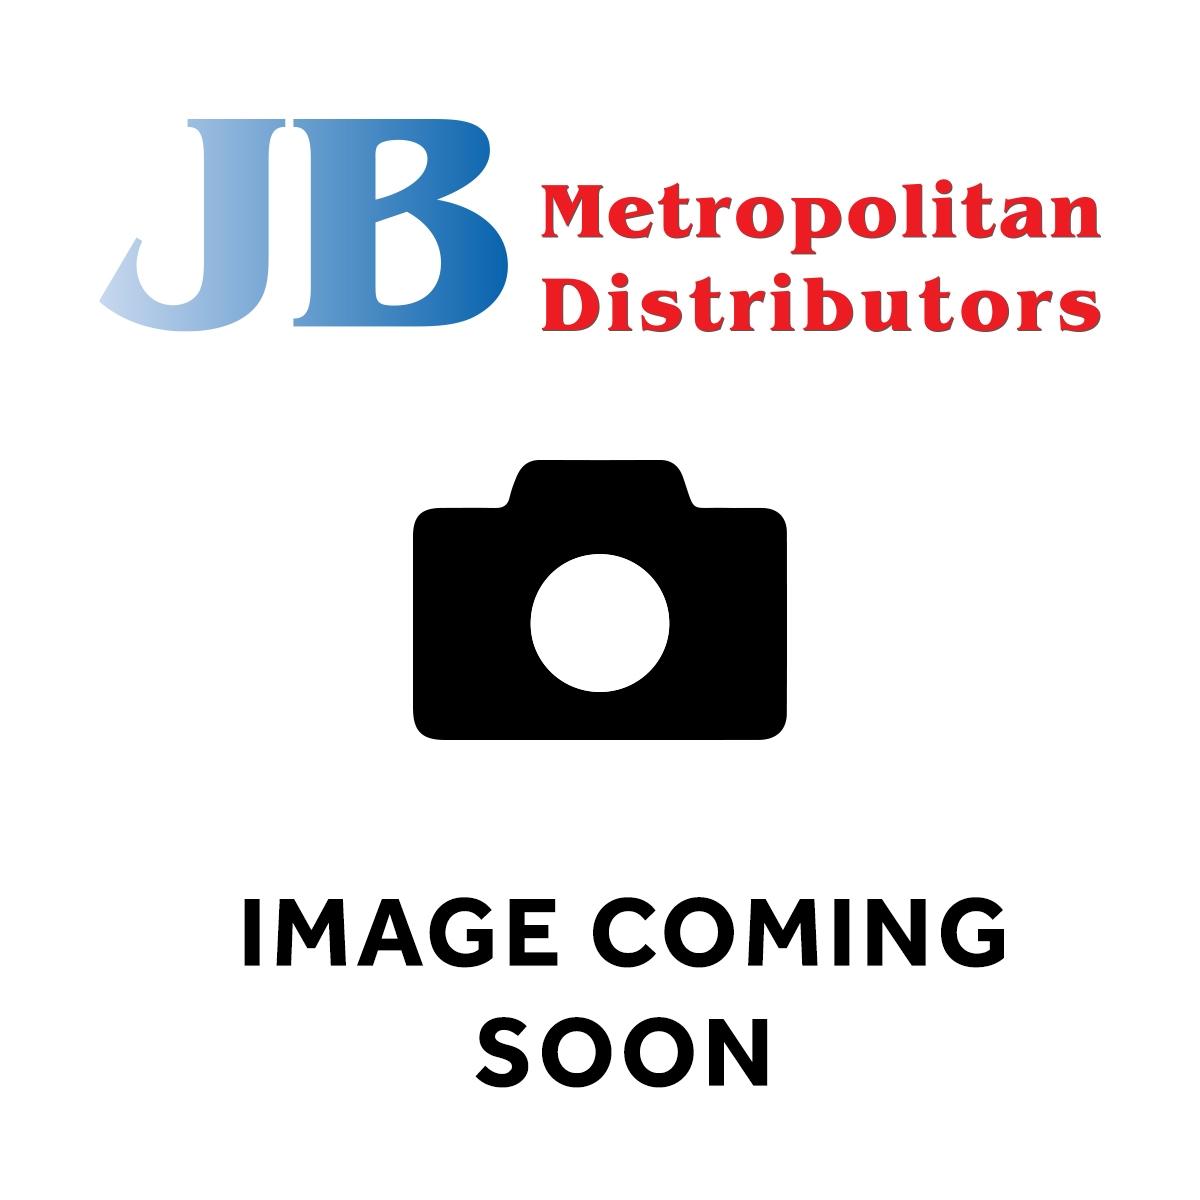 110ML CANCER COUNCIL 50+ KIDS